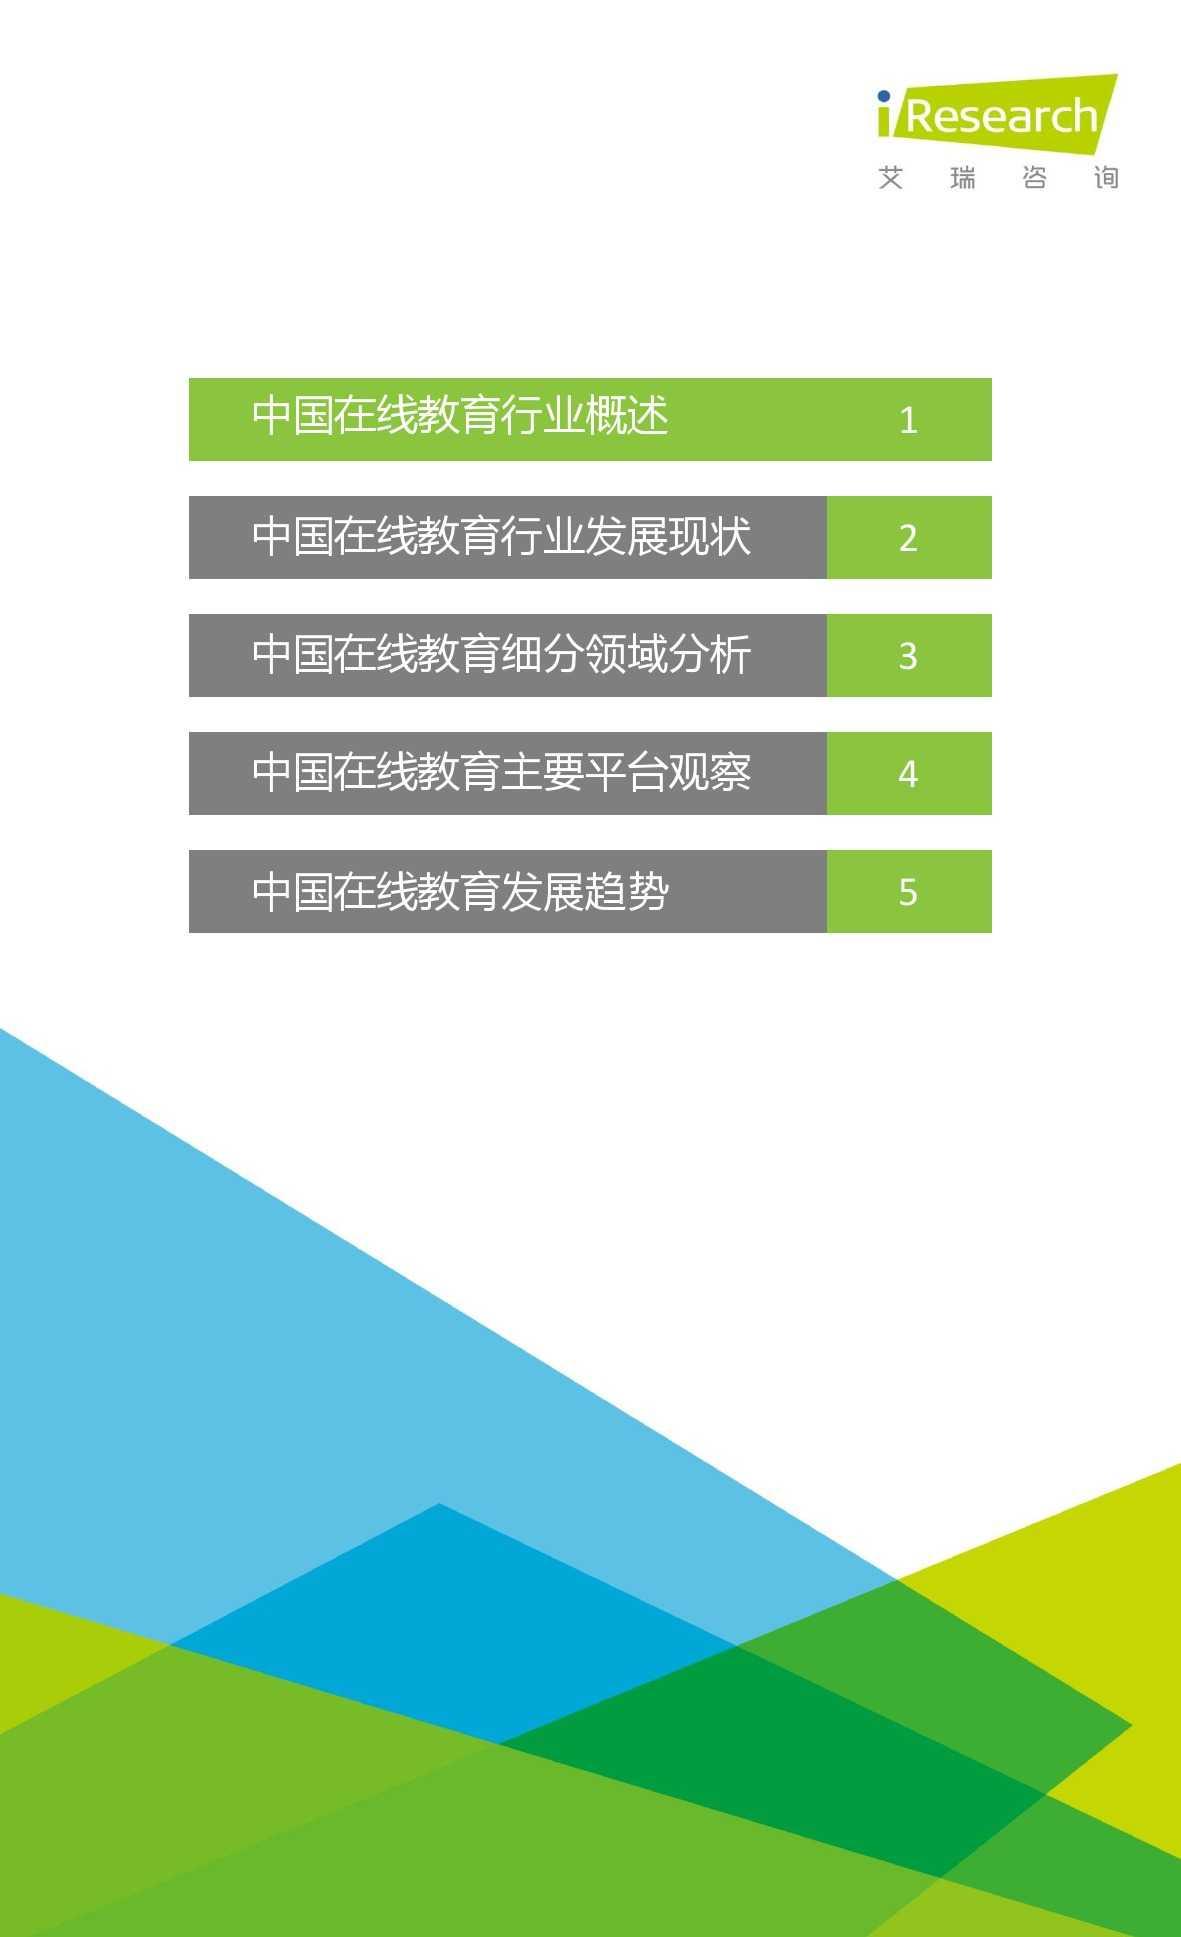 iResearch-2015年中国在线教育平台研究报告_000003